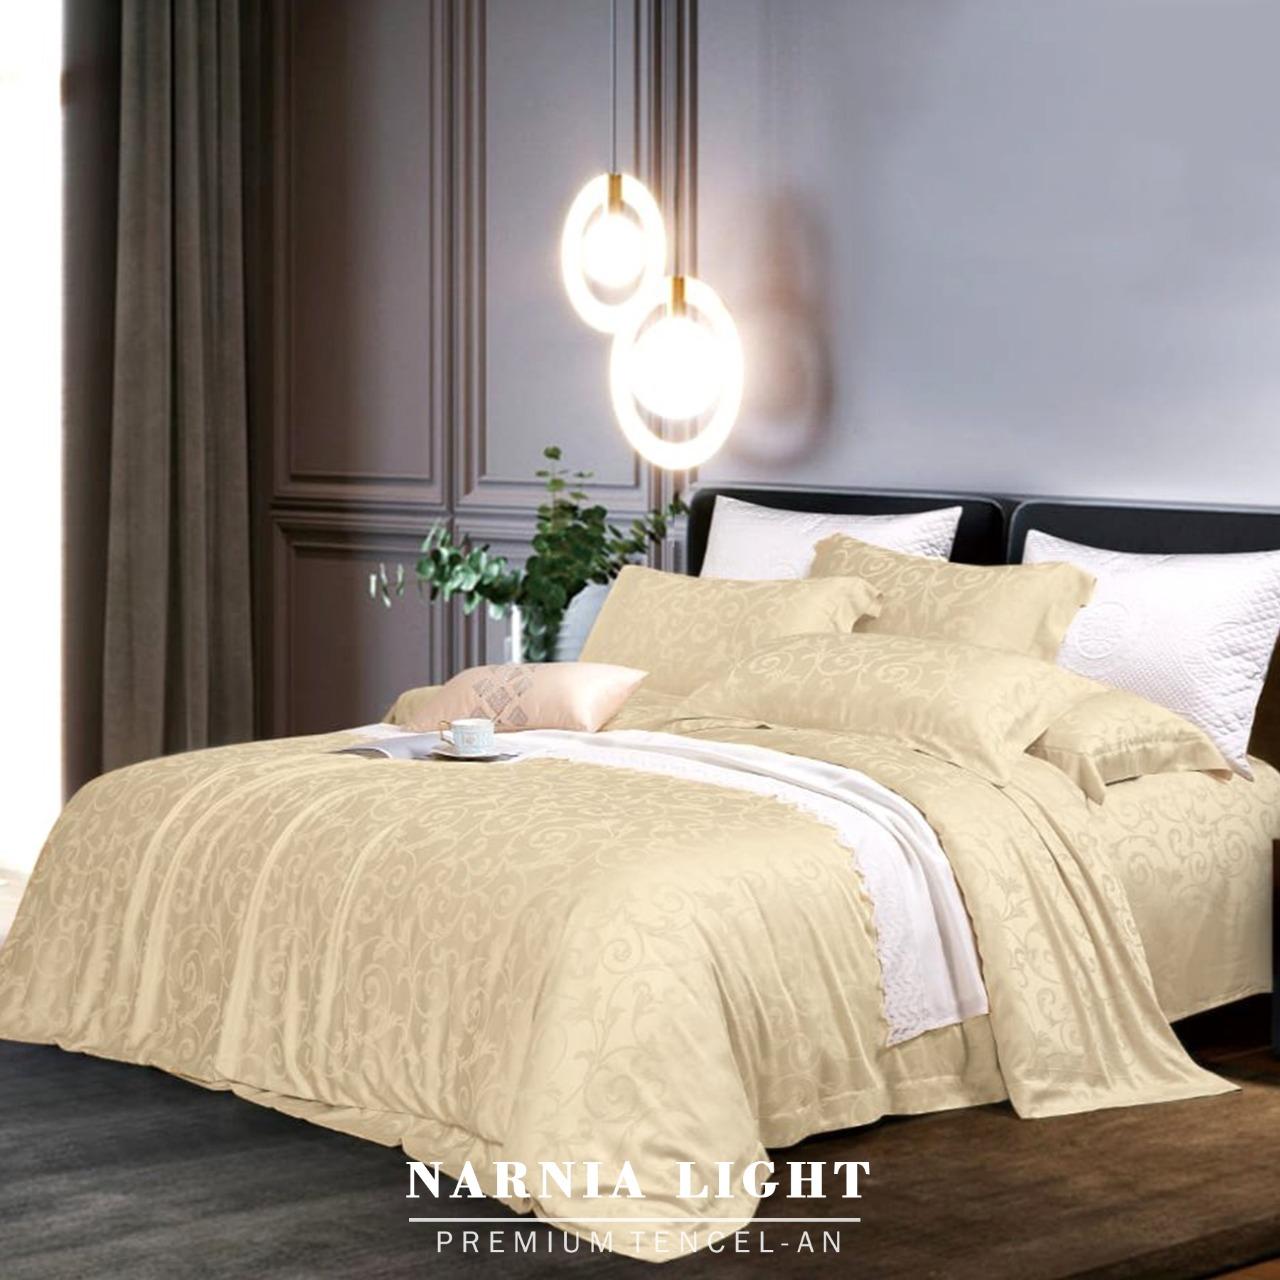 Narnia - Premium Tencel Bedding Set